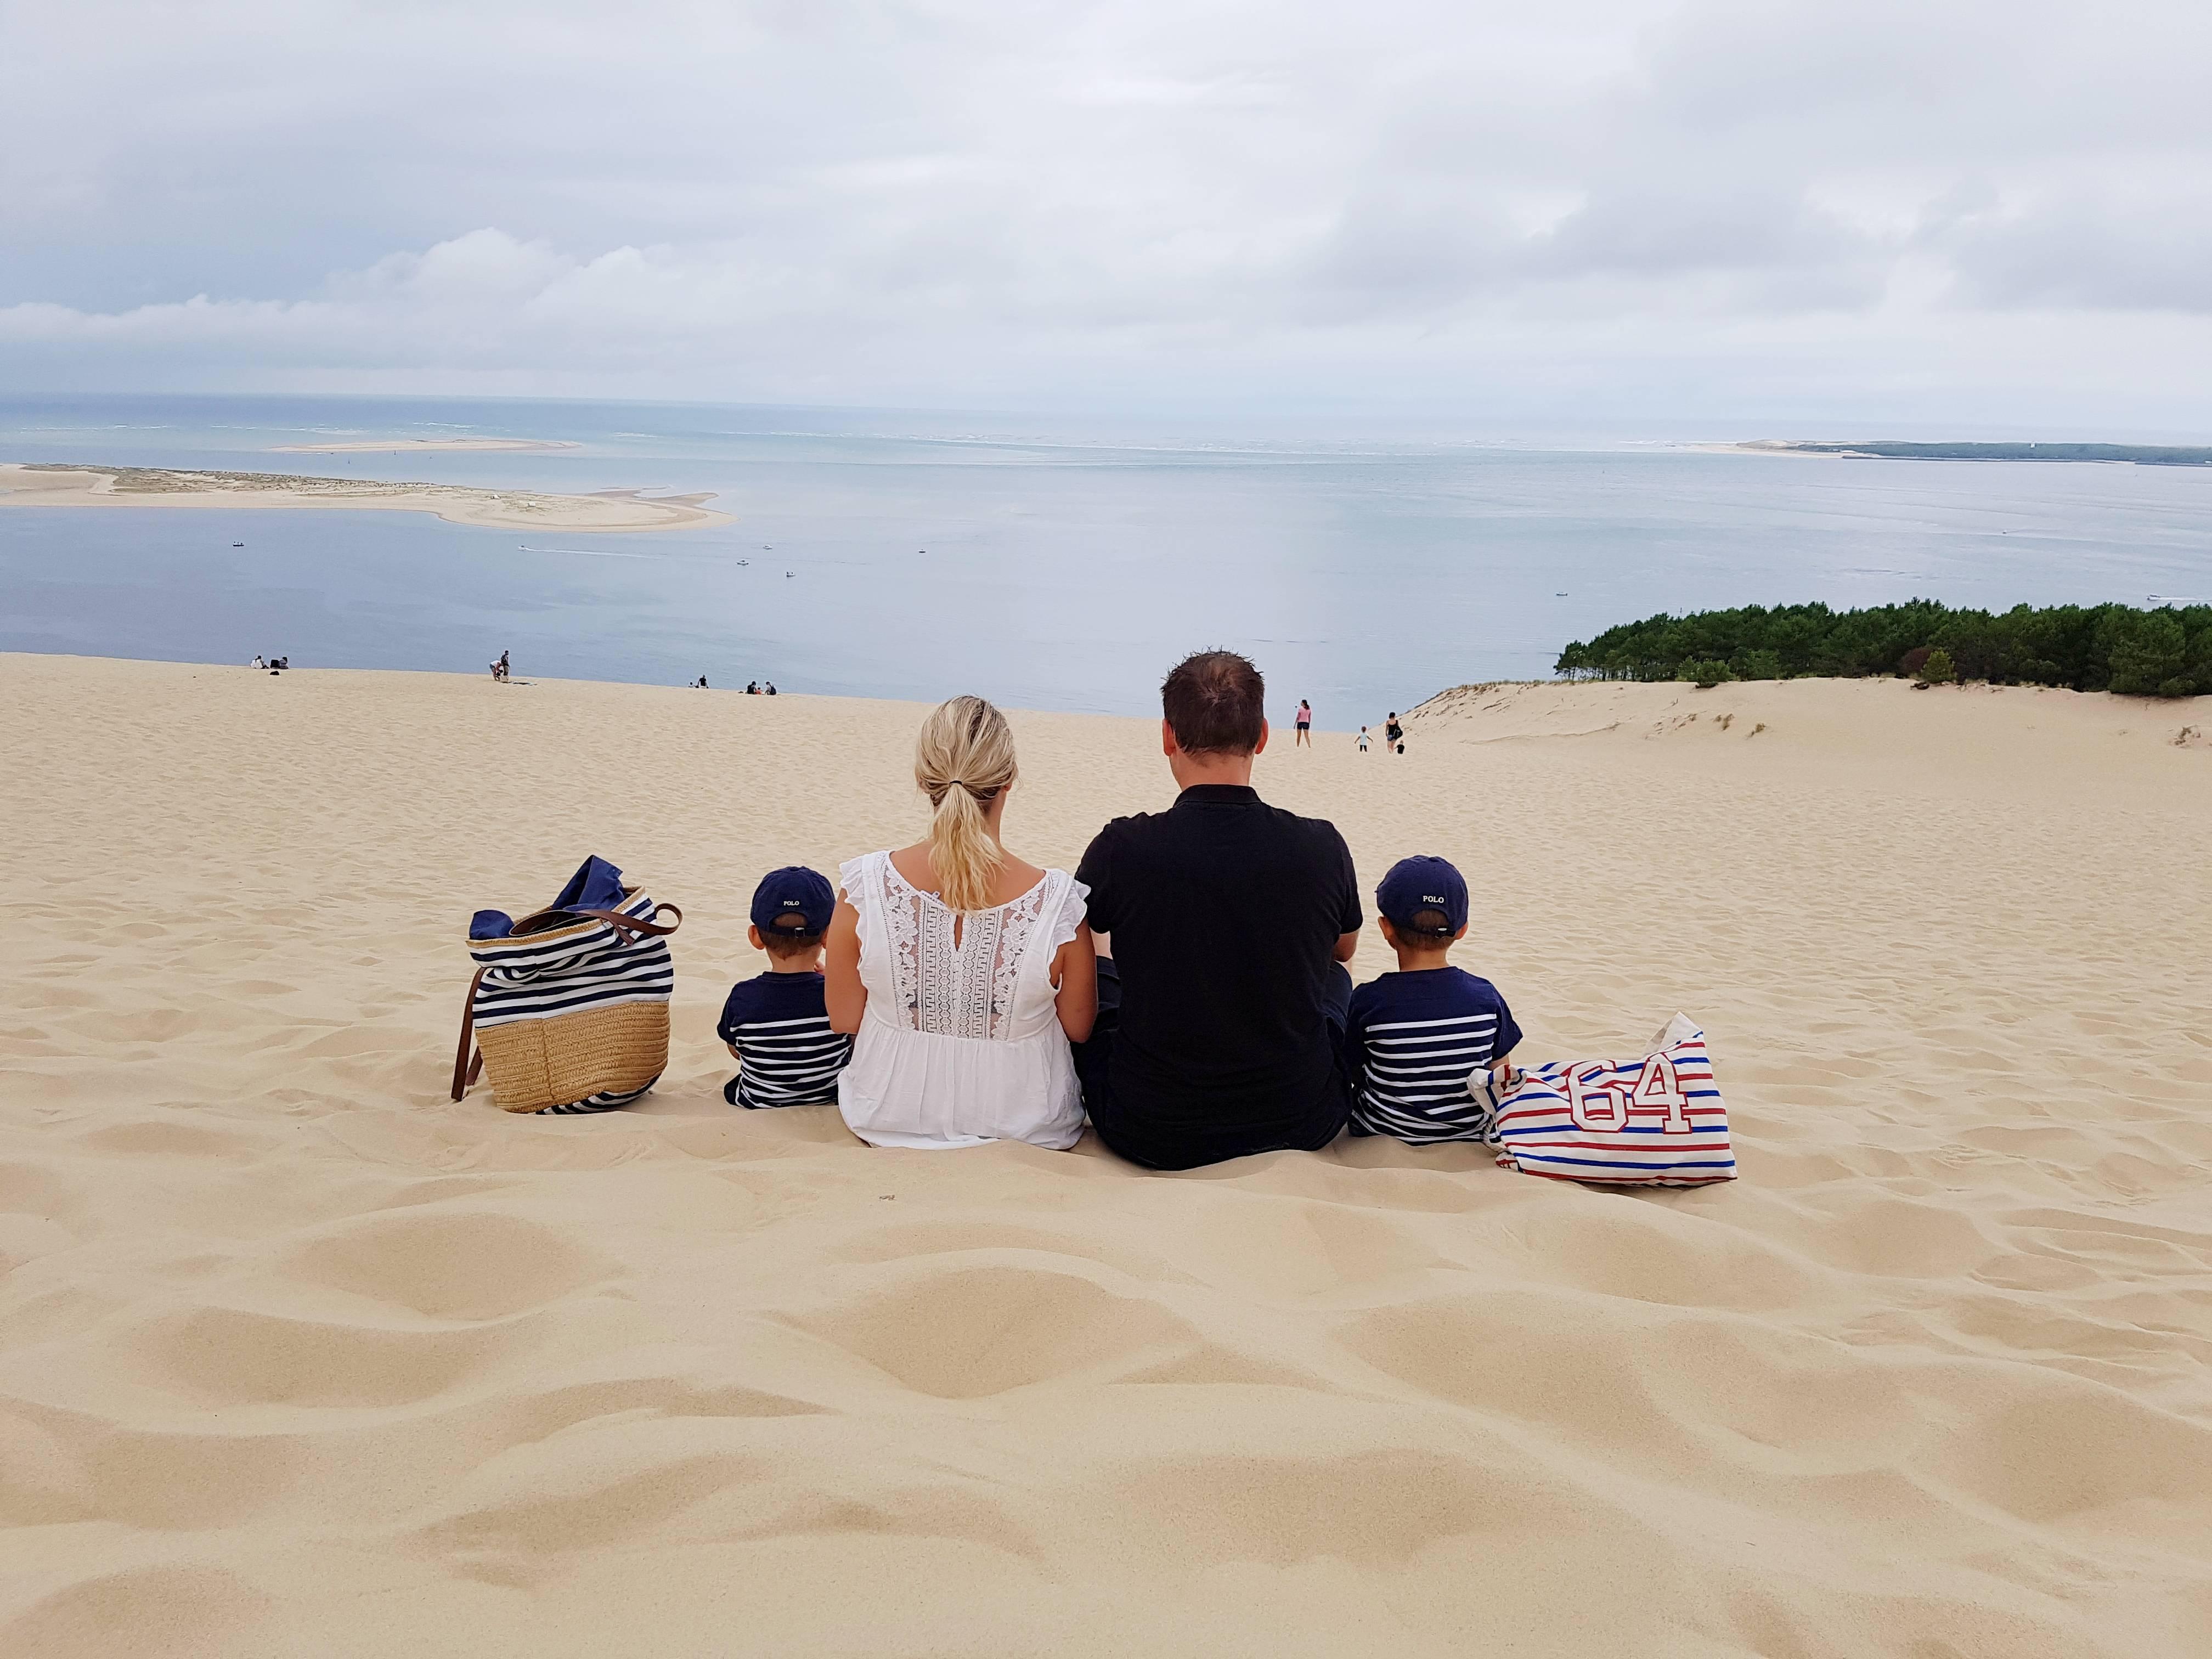 Photo 1: La dune du Pyla 😍